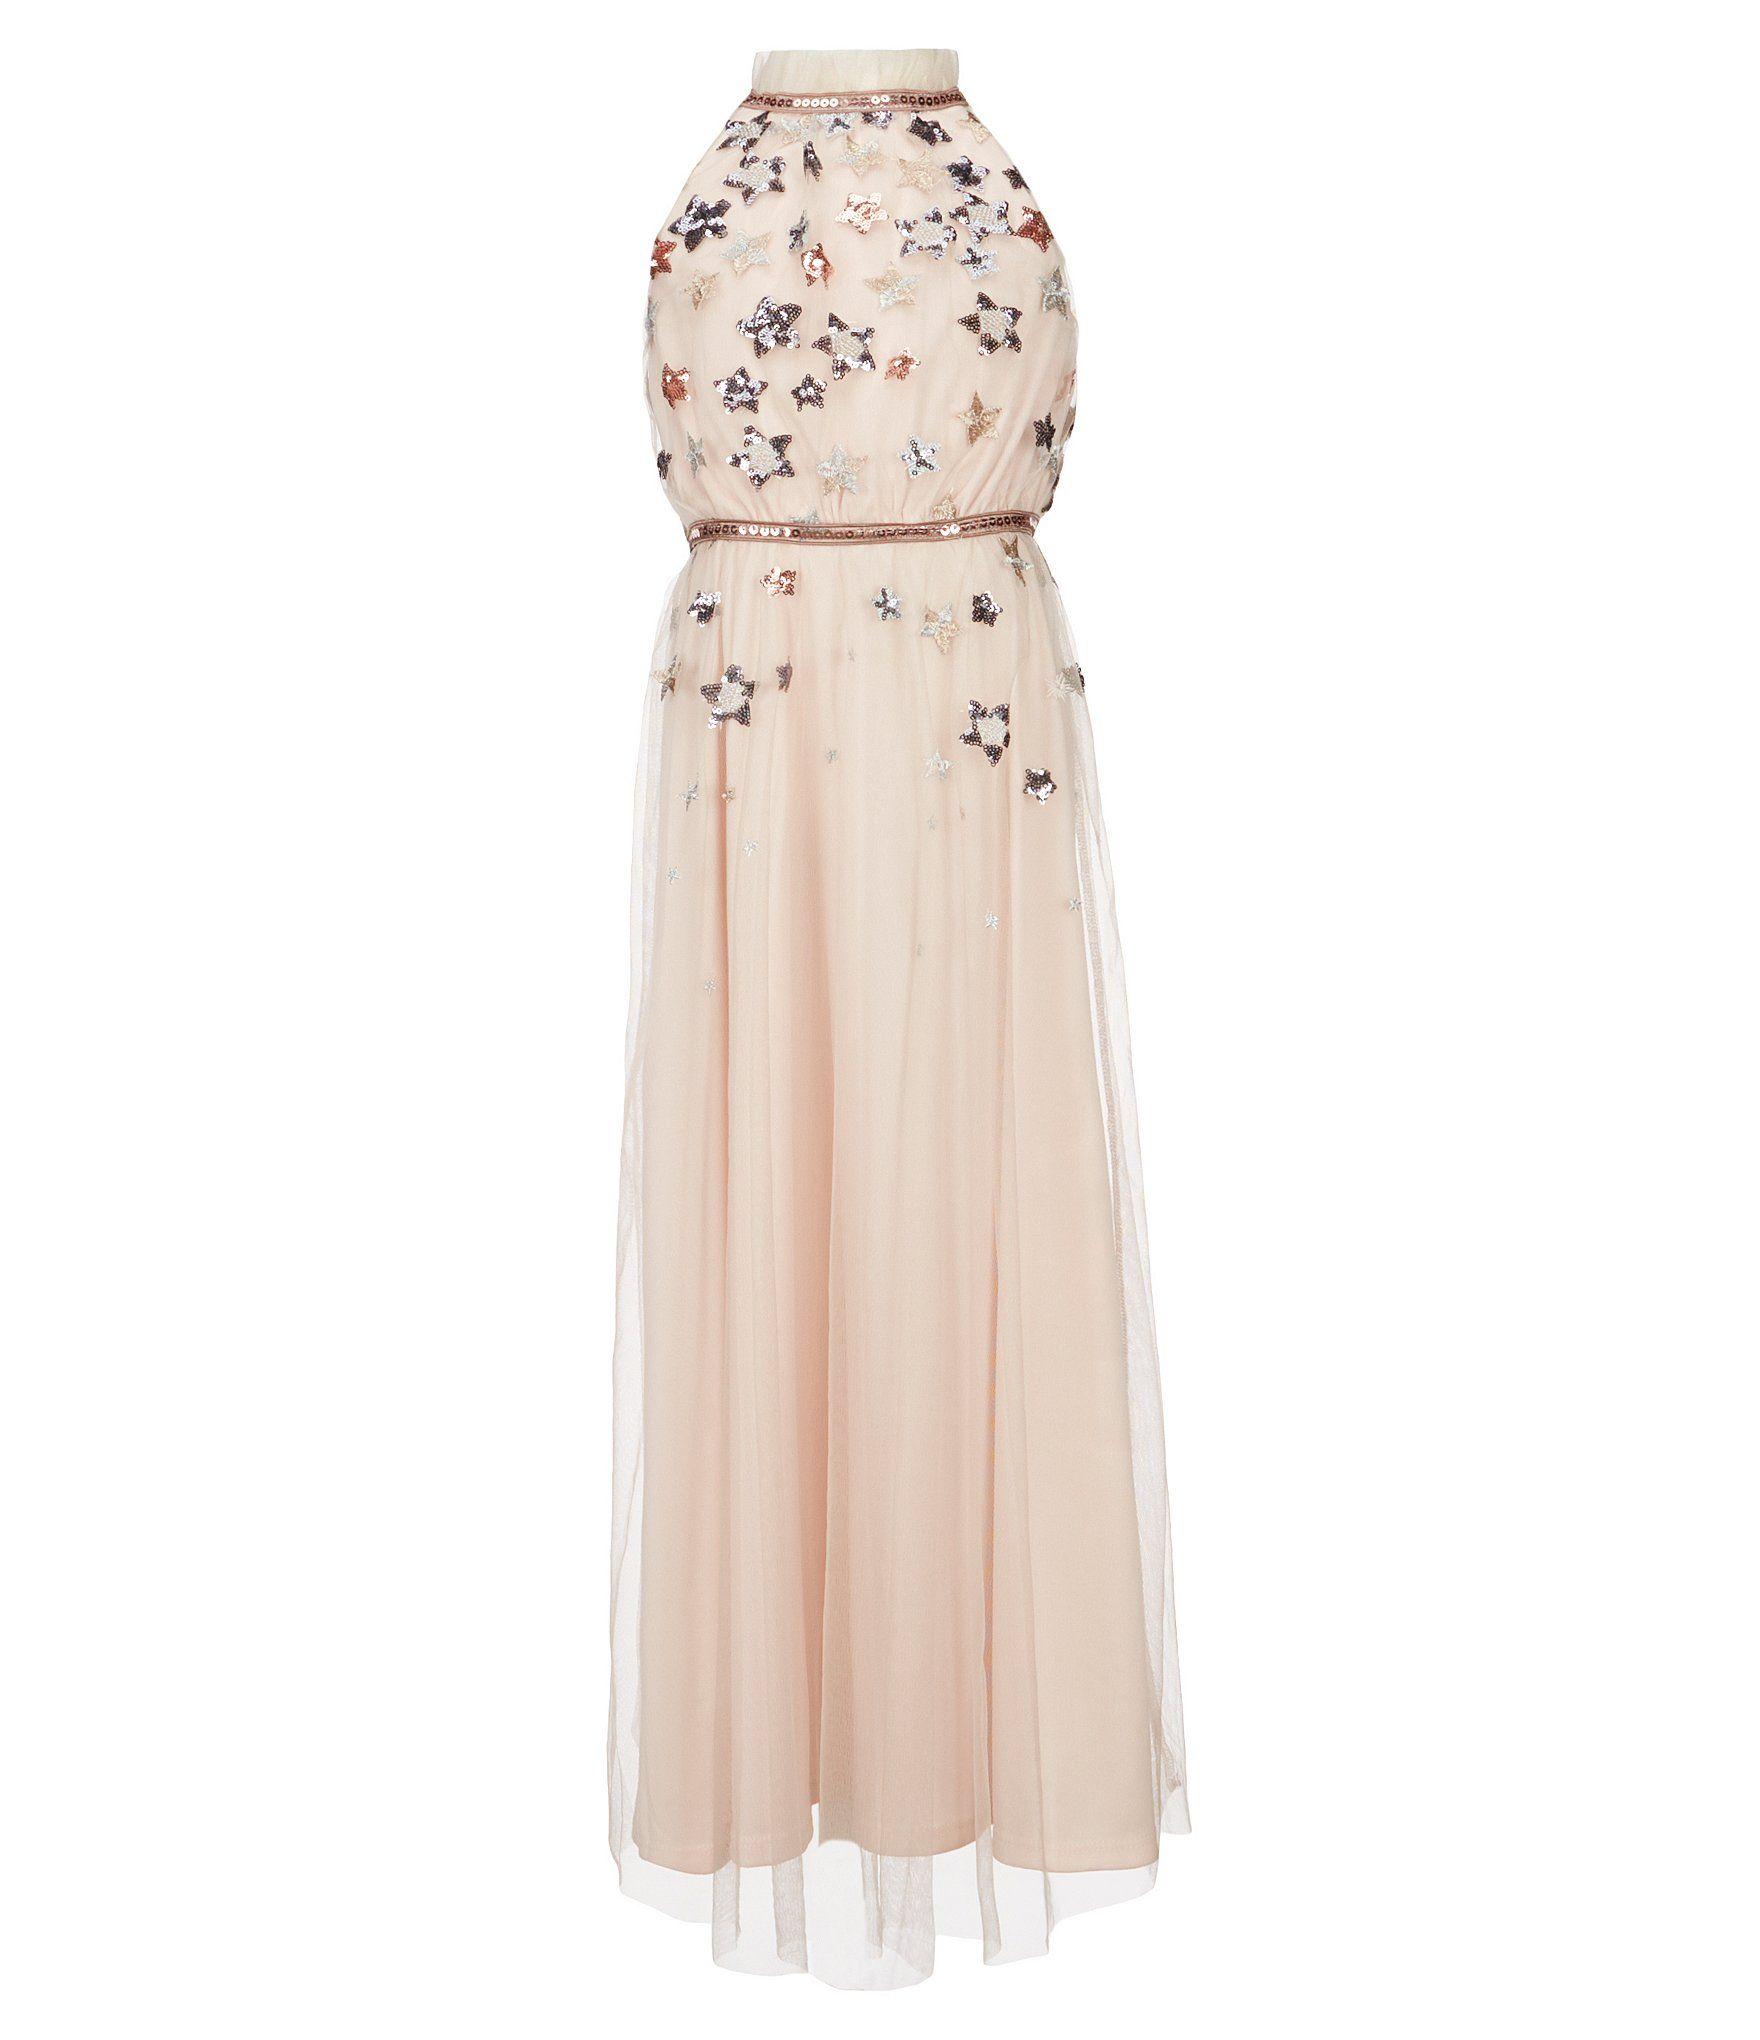 ed7878a965bf Shop for GB Girls Social Big Girls 7-16 Star-Print Maxi Dress at Dillards. com. Visit Dillards.com to find clothing